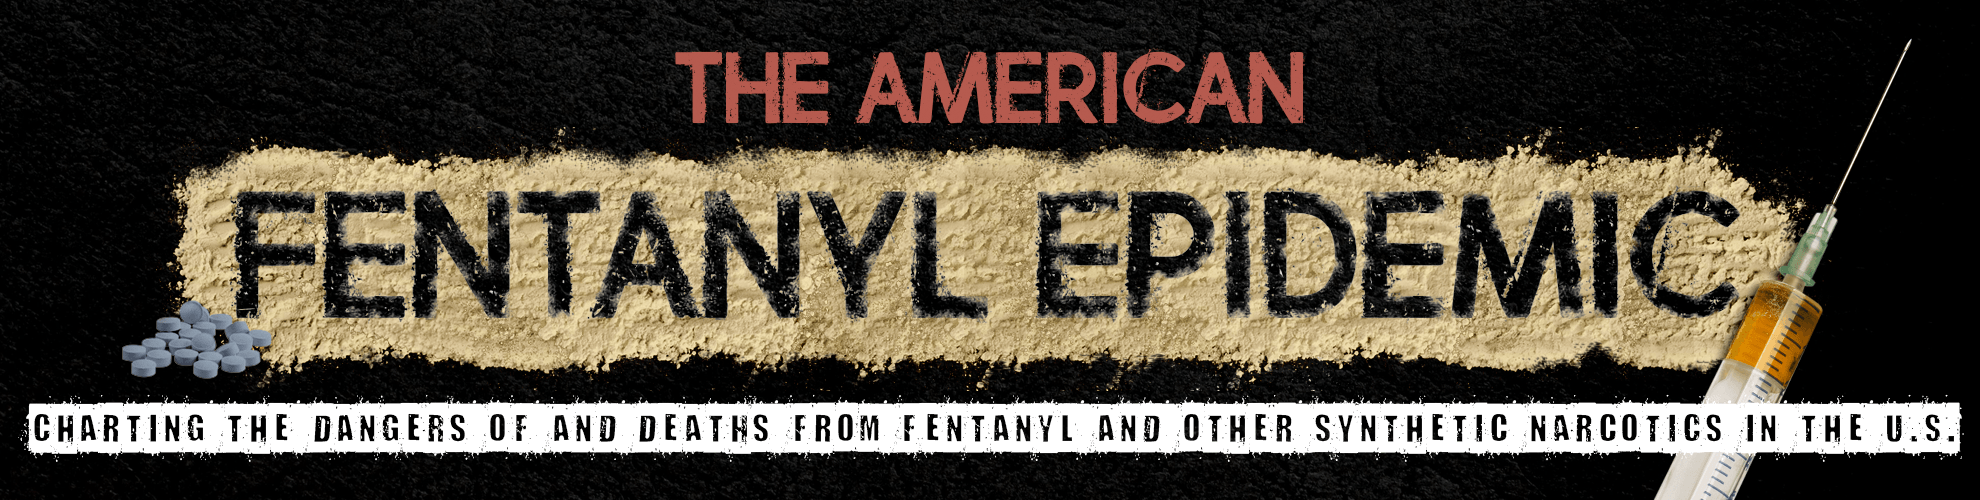 the-american-fentanyl-epidemic-header